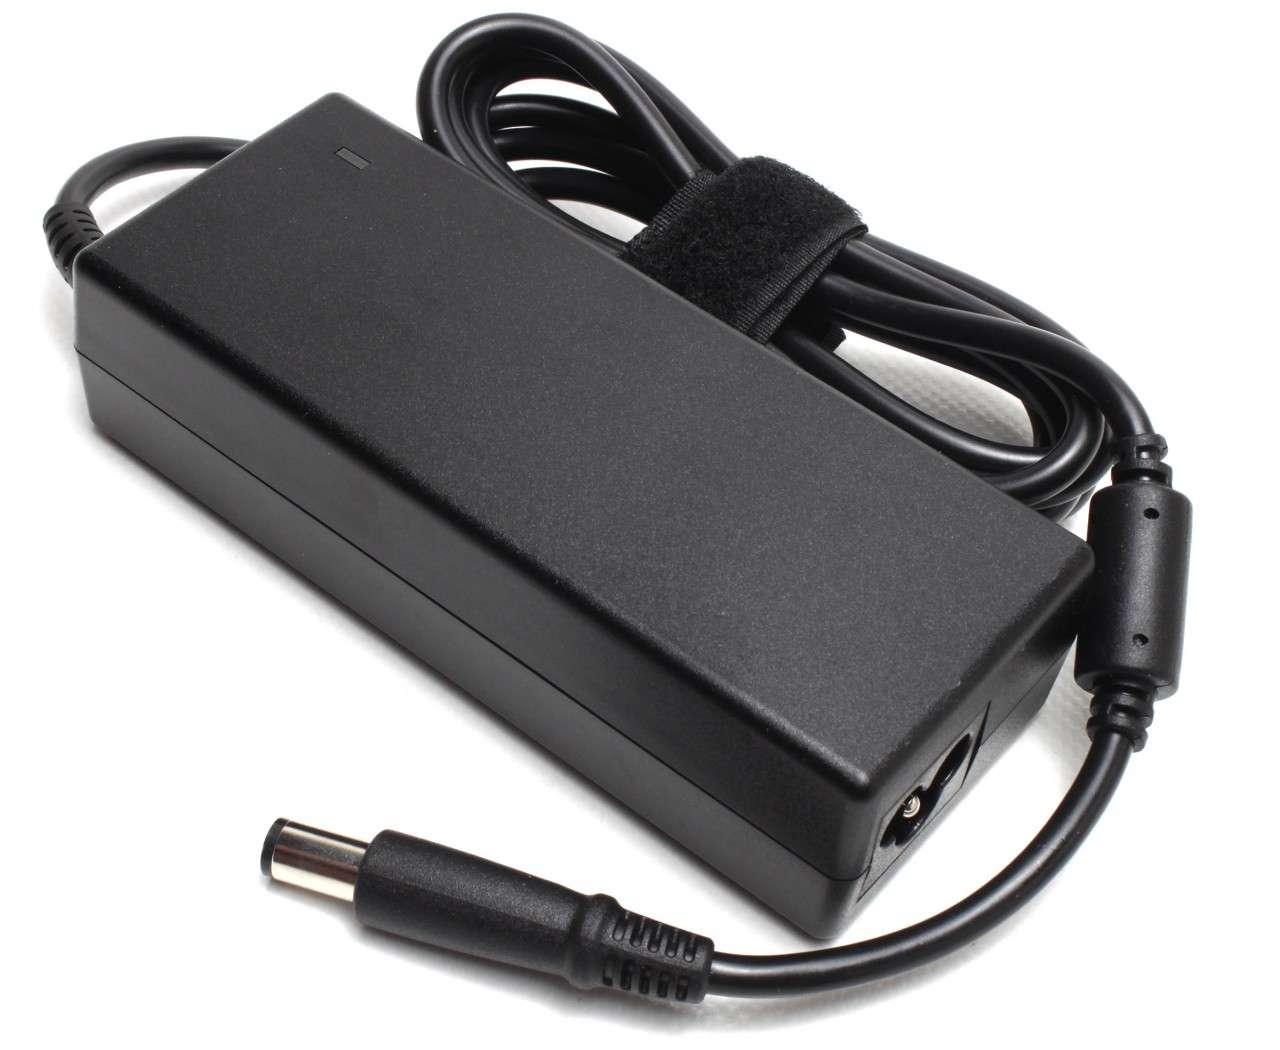 Incarcator Dell Inspiron 1428 VARIANTA 3 imagine powerlaptop.ro 2021